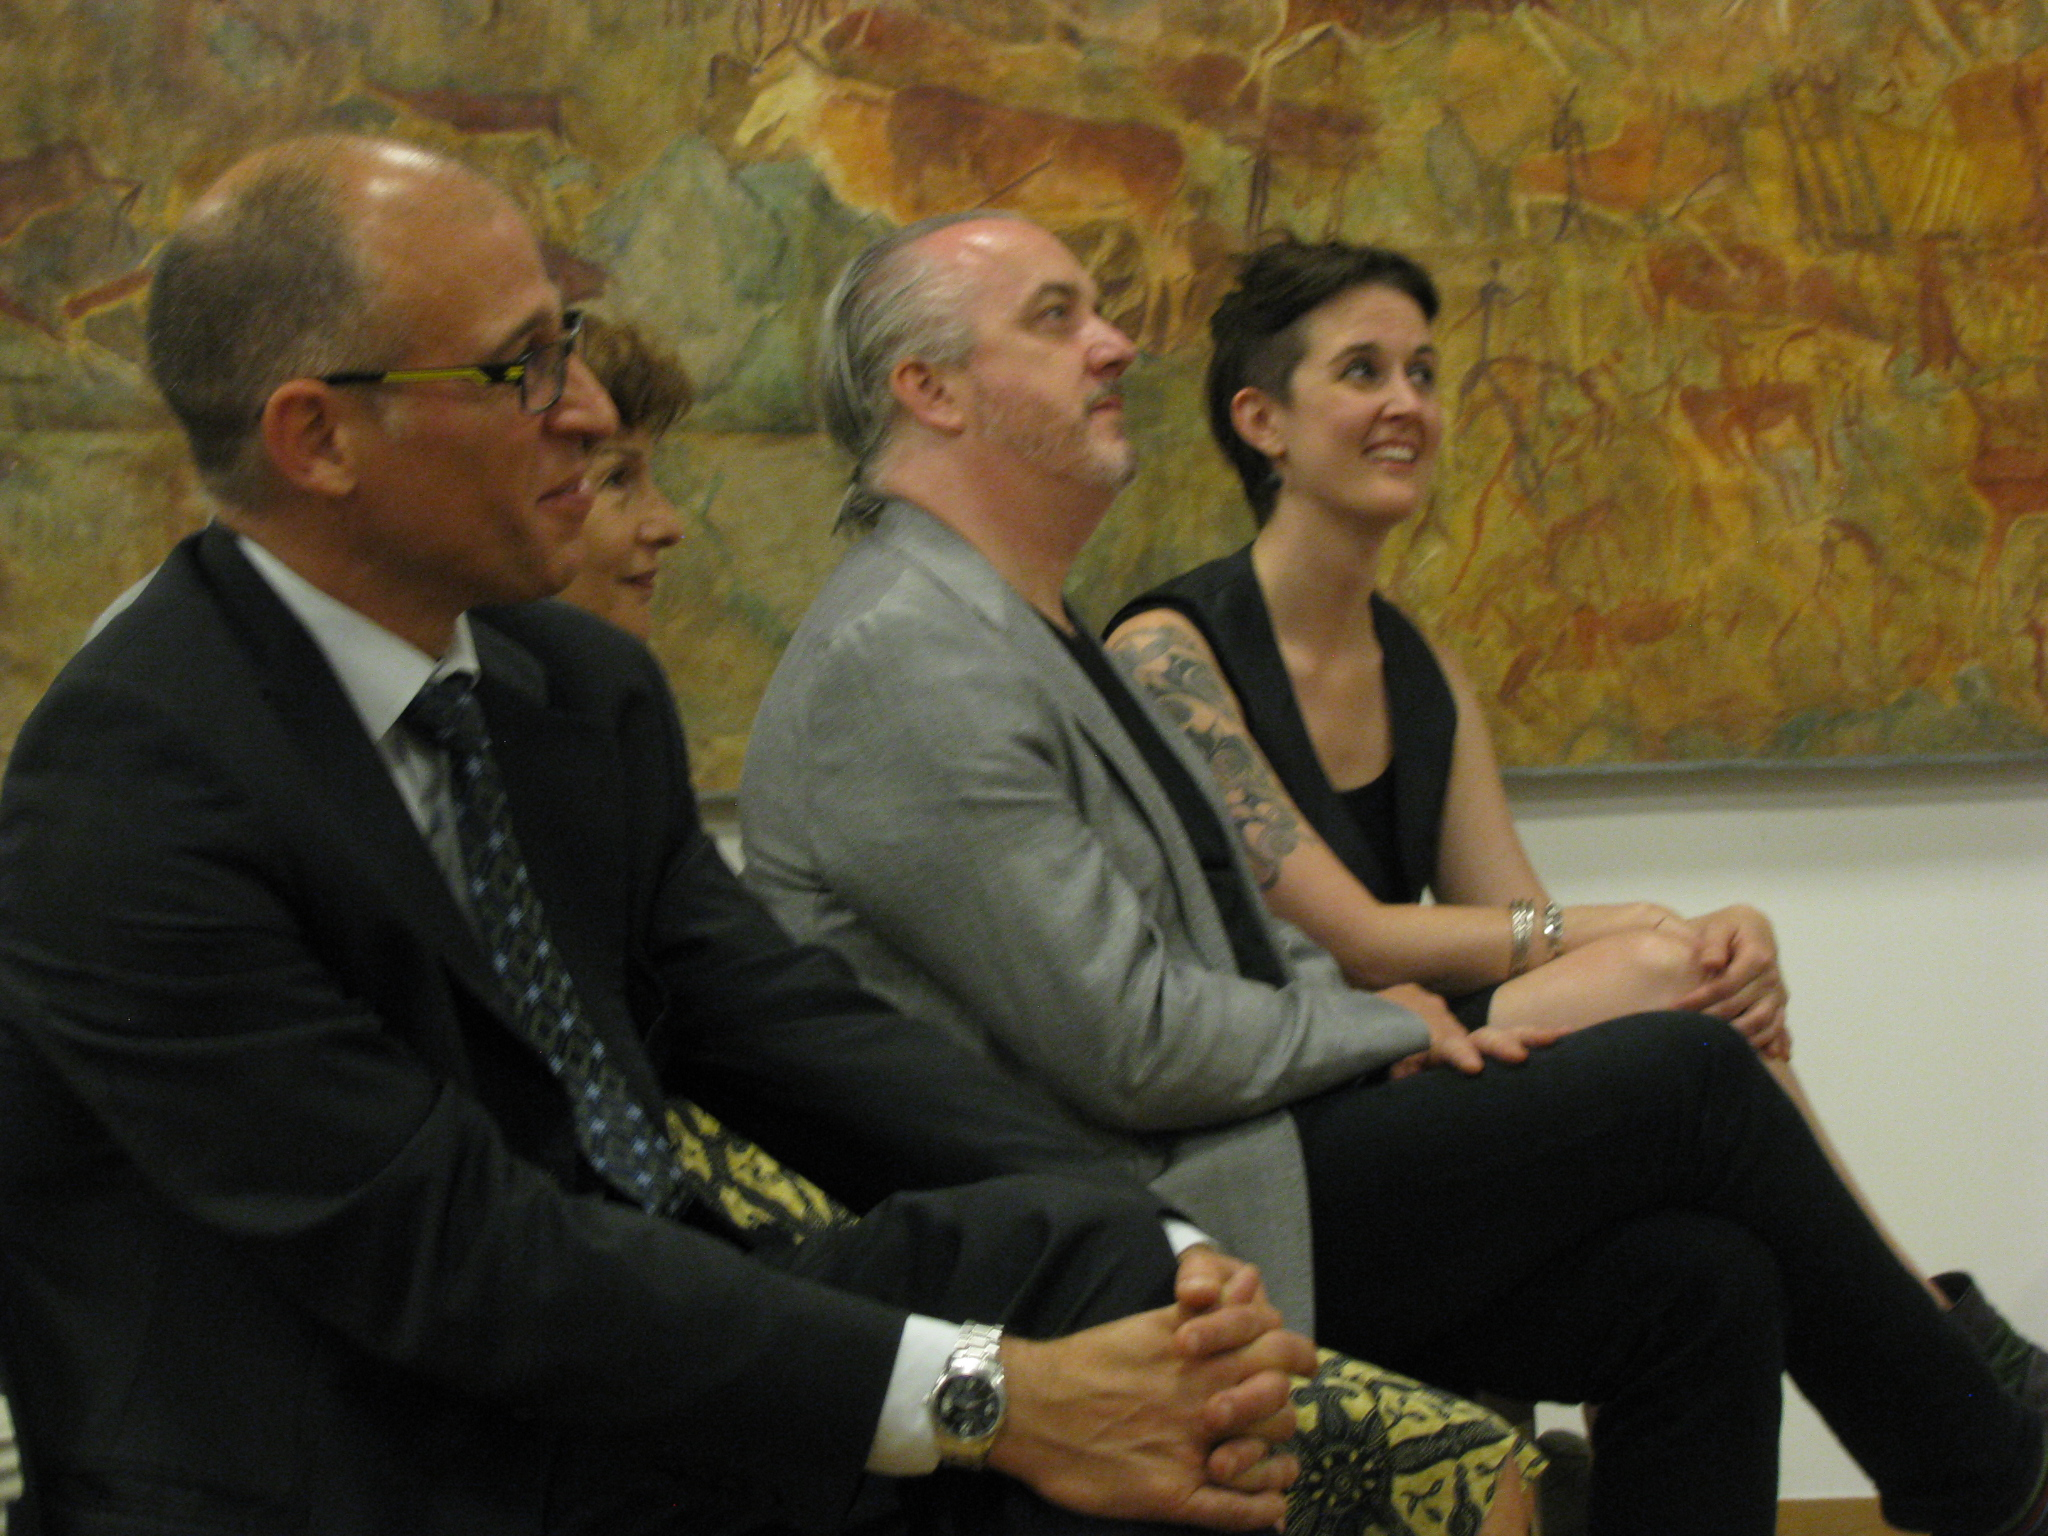 Left to right: Leonardo Tonus, Gabriella Scheer, Benjamin Dwyer, Kimberley Campanello.